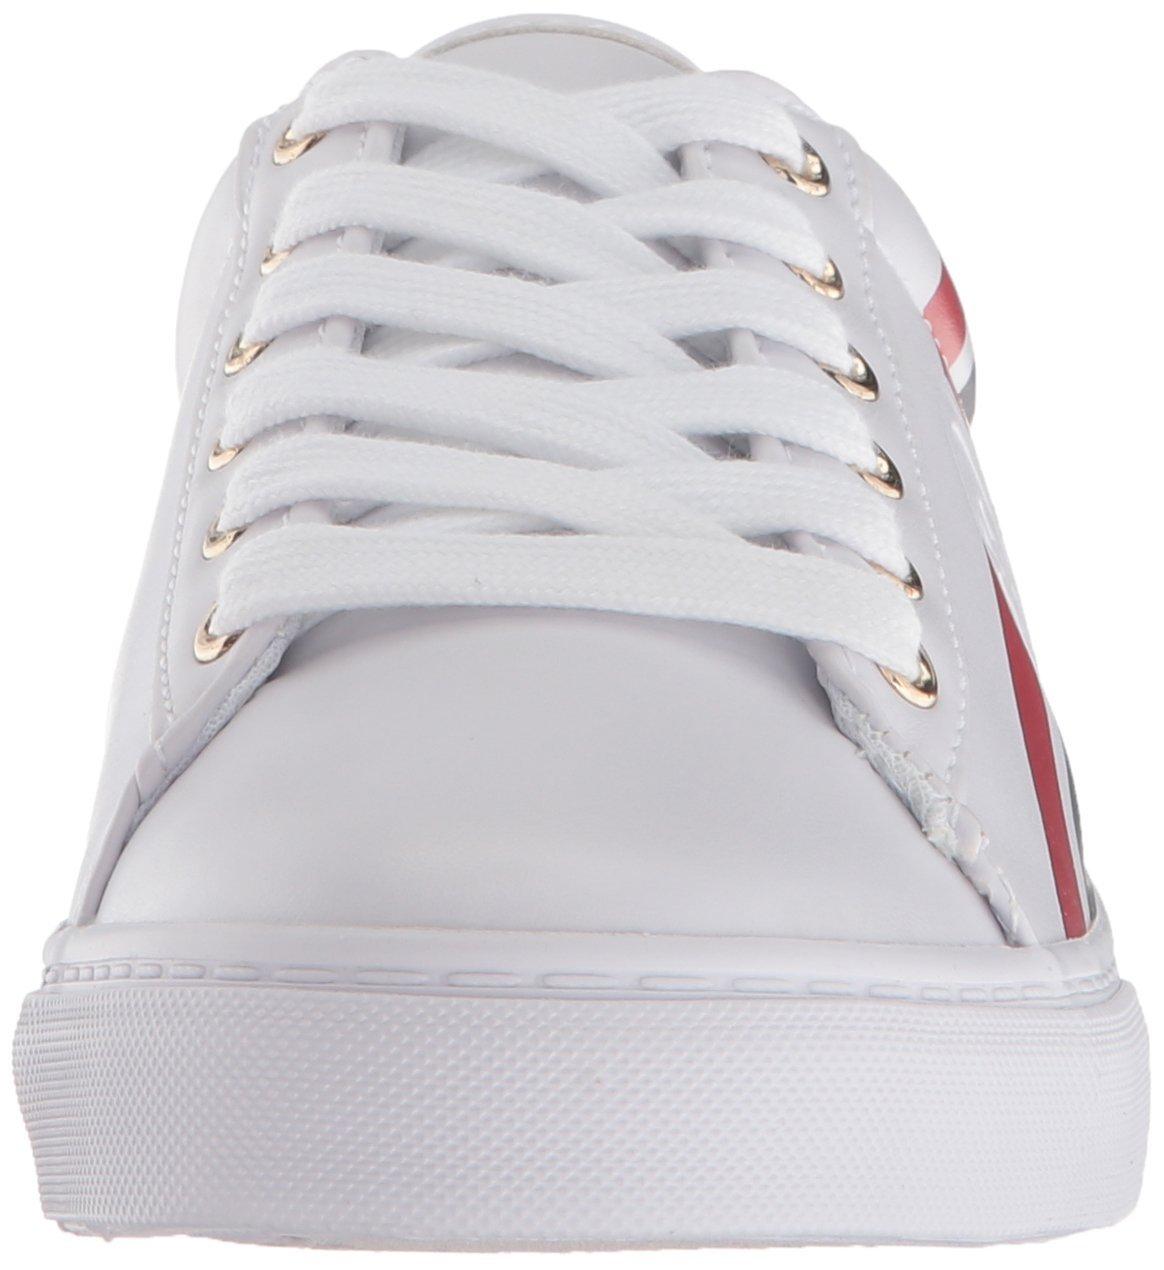 48d38bdcf1e Tommy Hilfiger - Zapatillas para Mujer